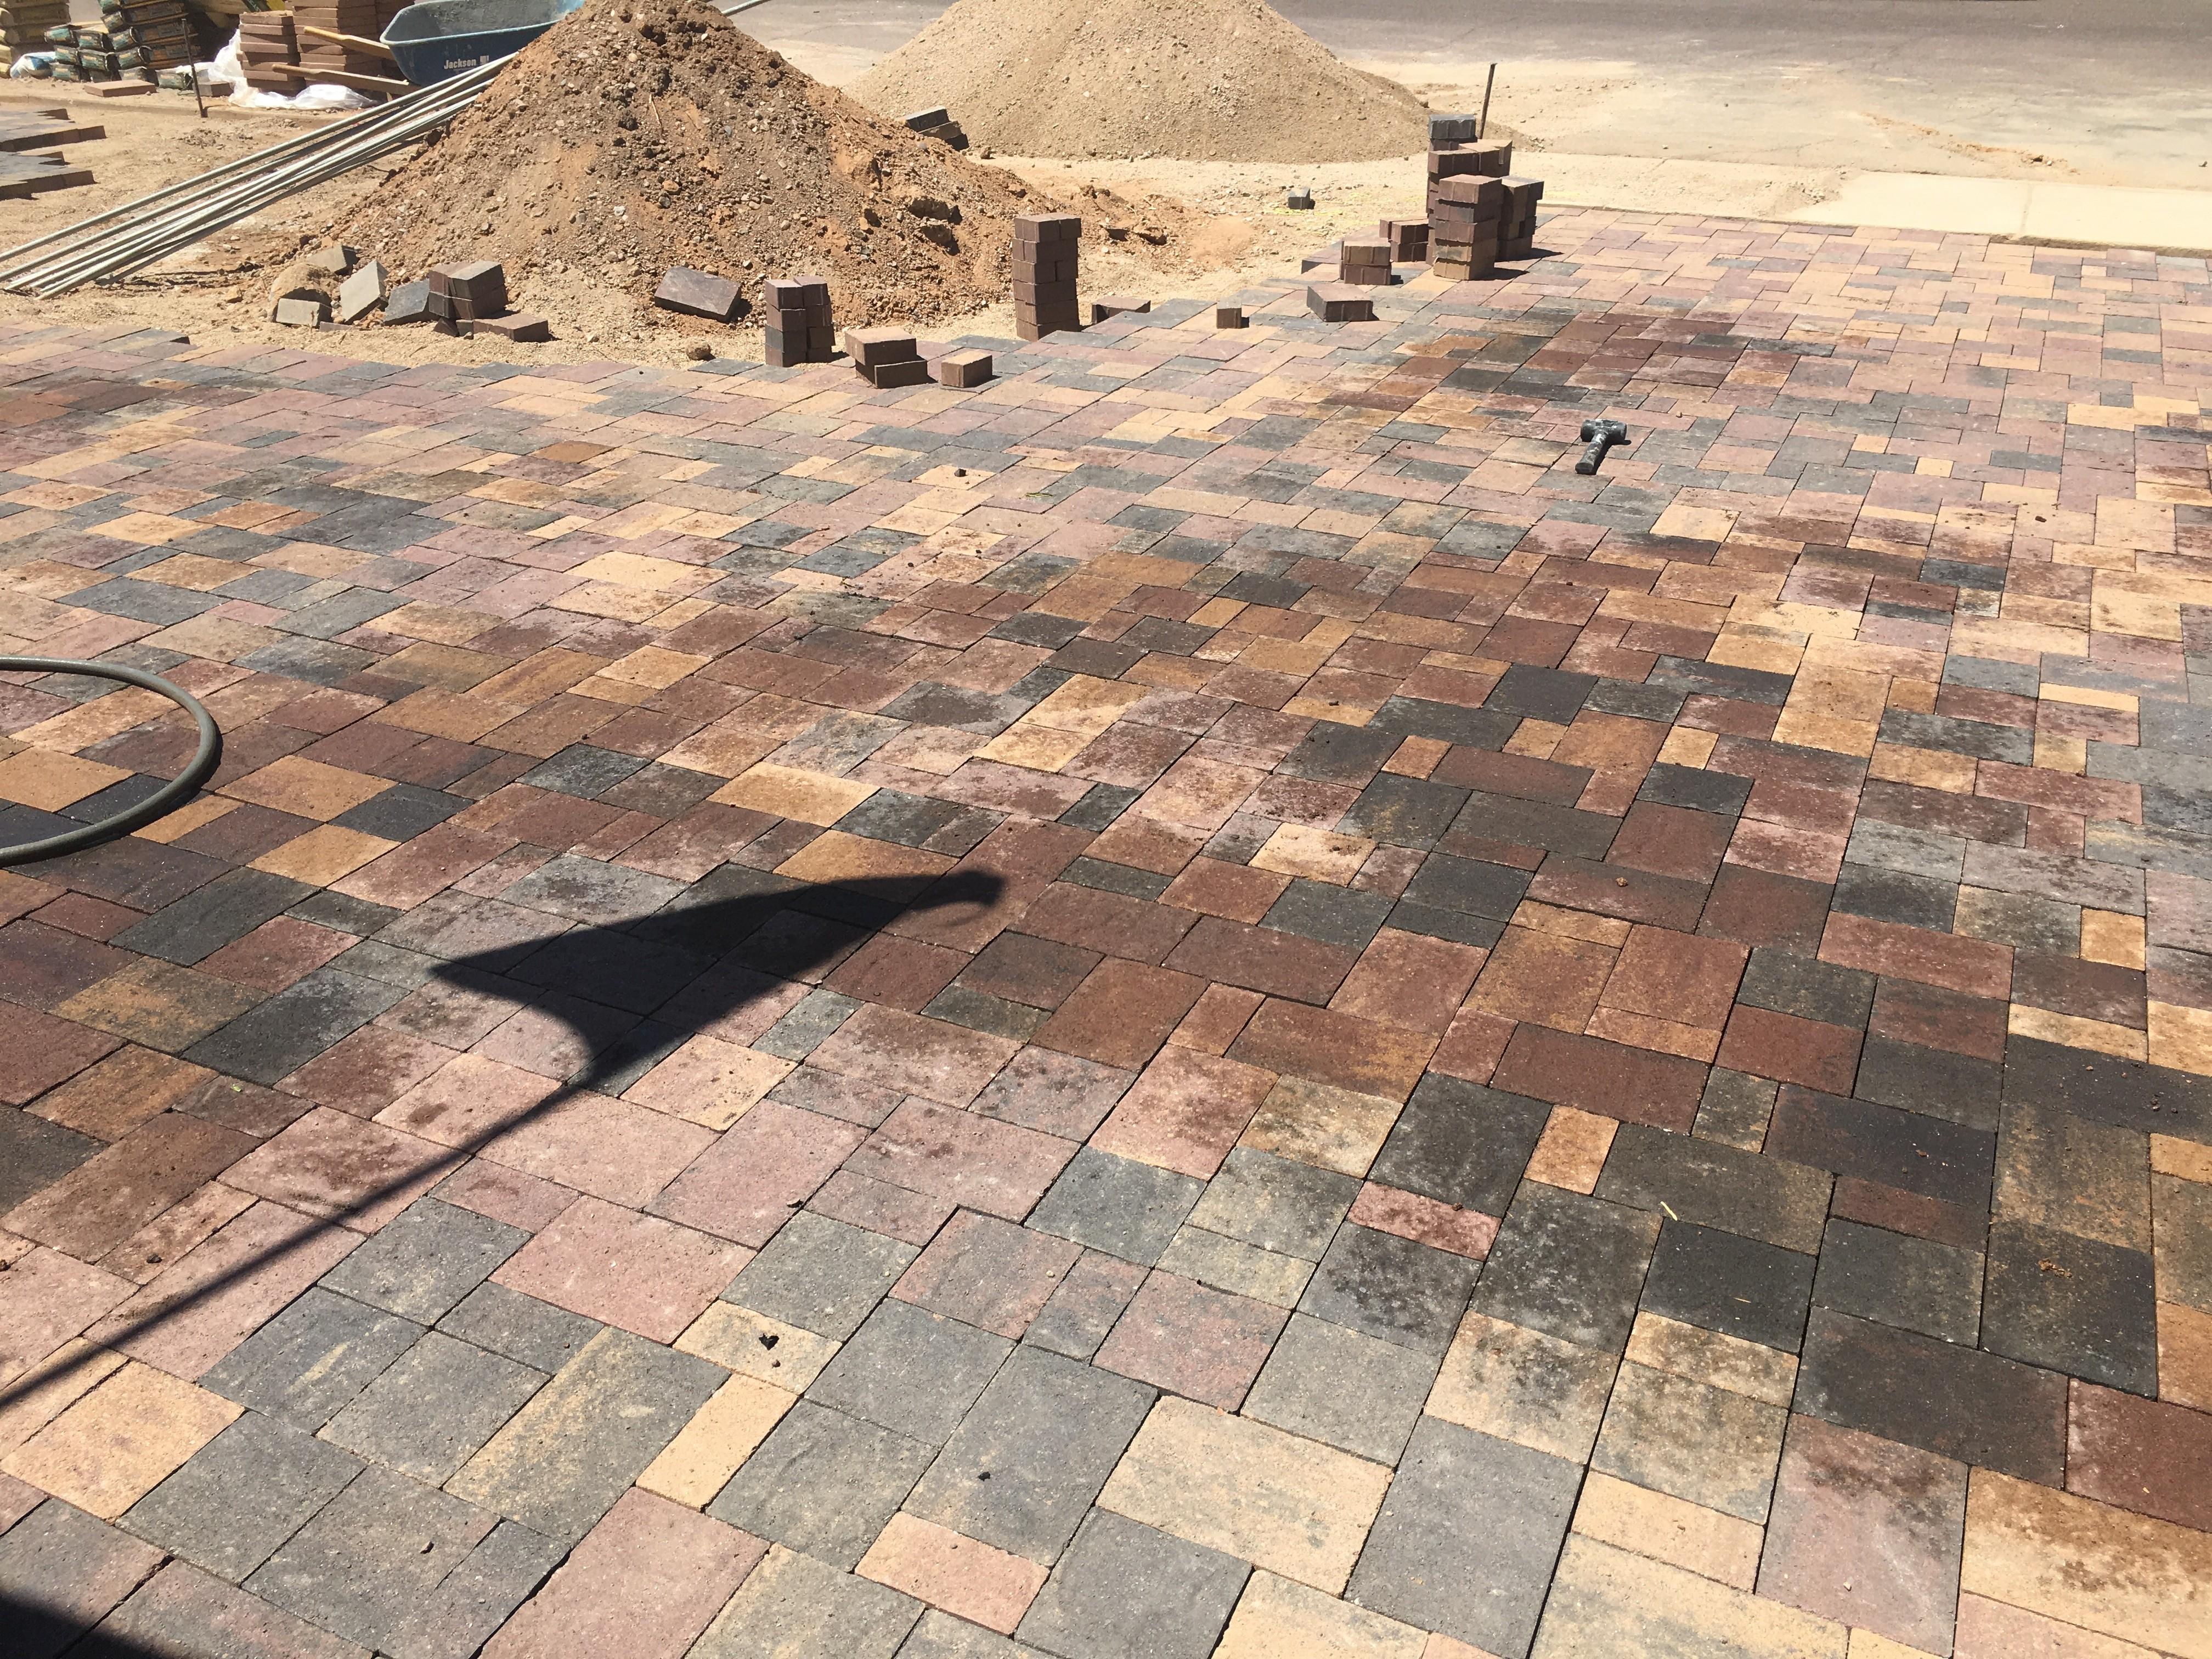 Best Brick Paver Sealer 2019 – Concrete Sealing Ratings